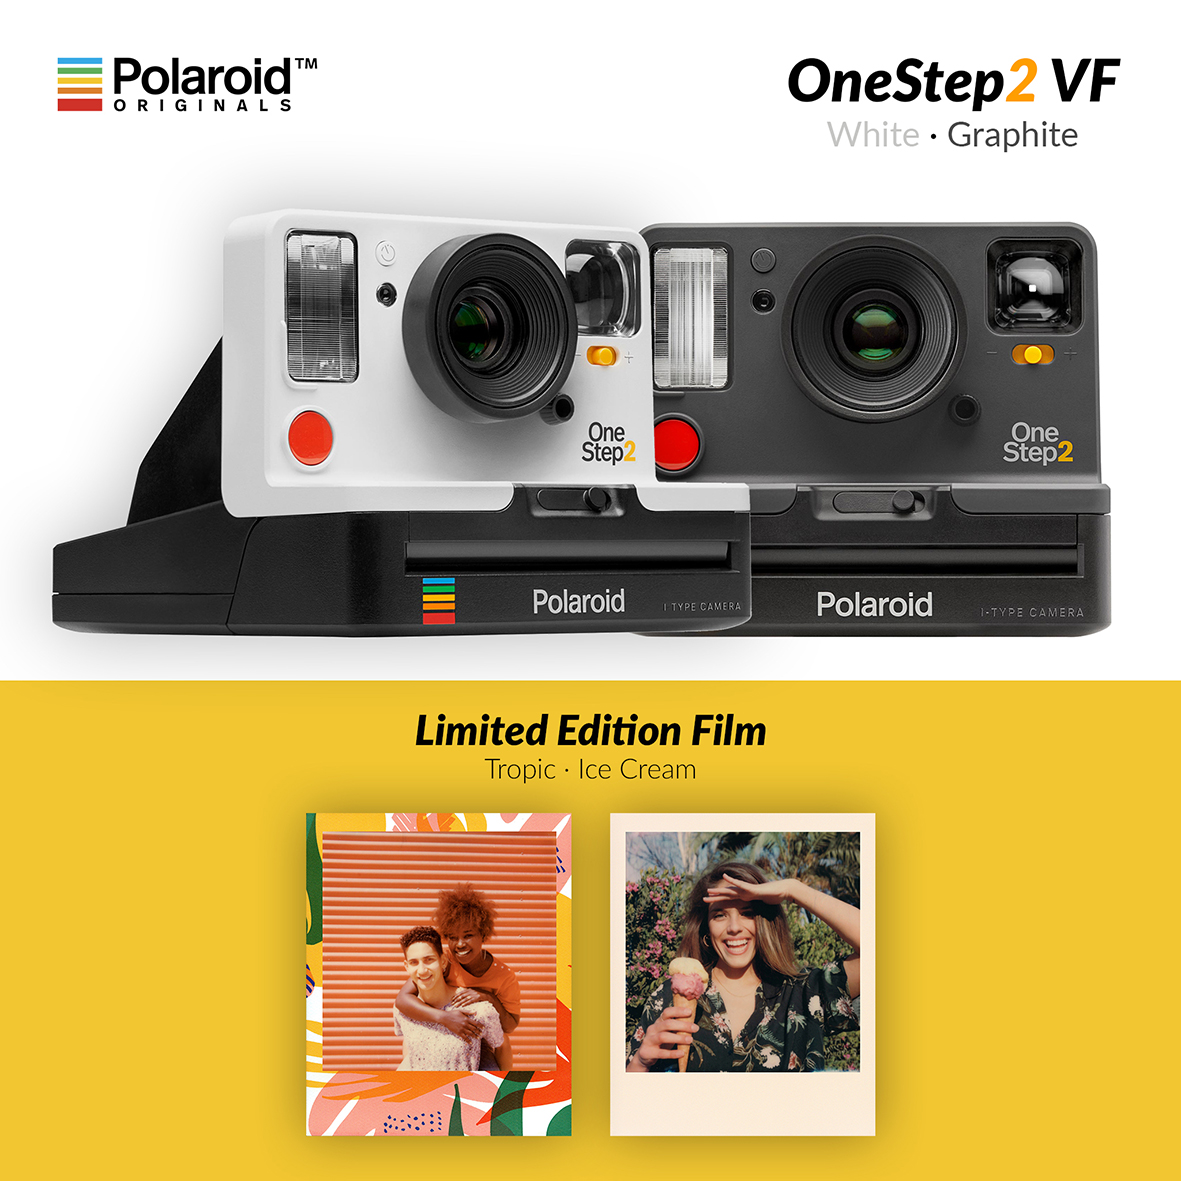 Wiiadomości z Polaroid Originals!